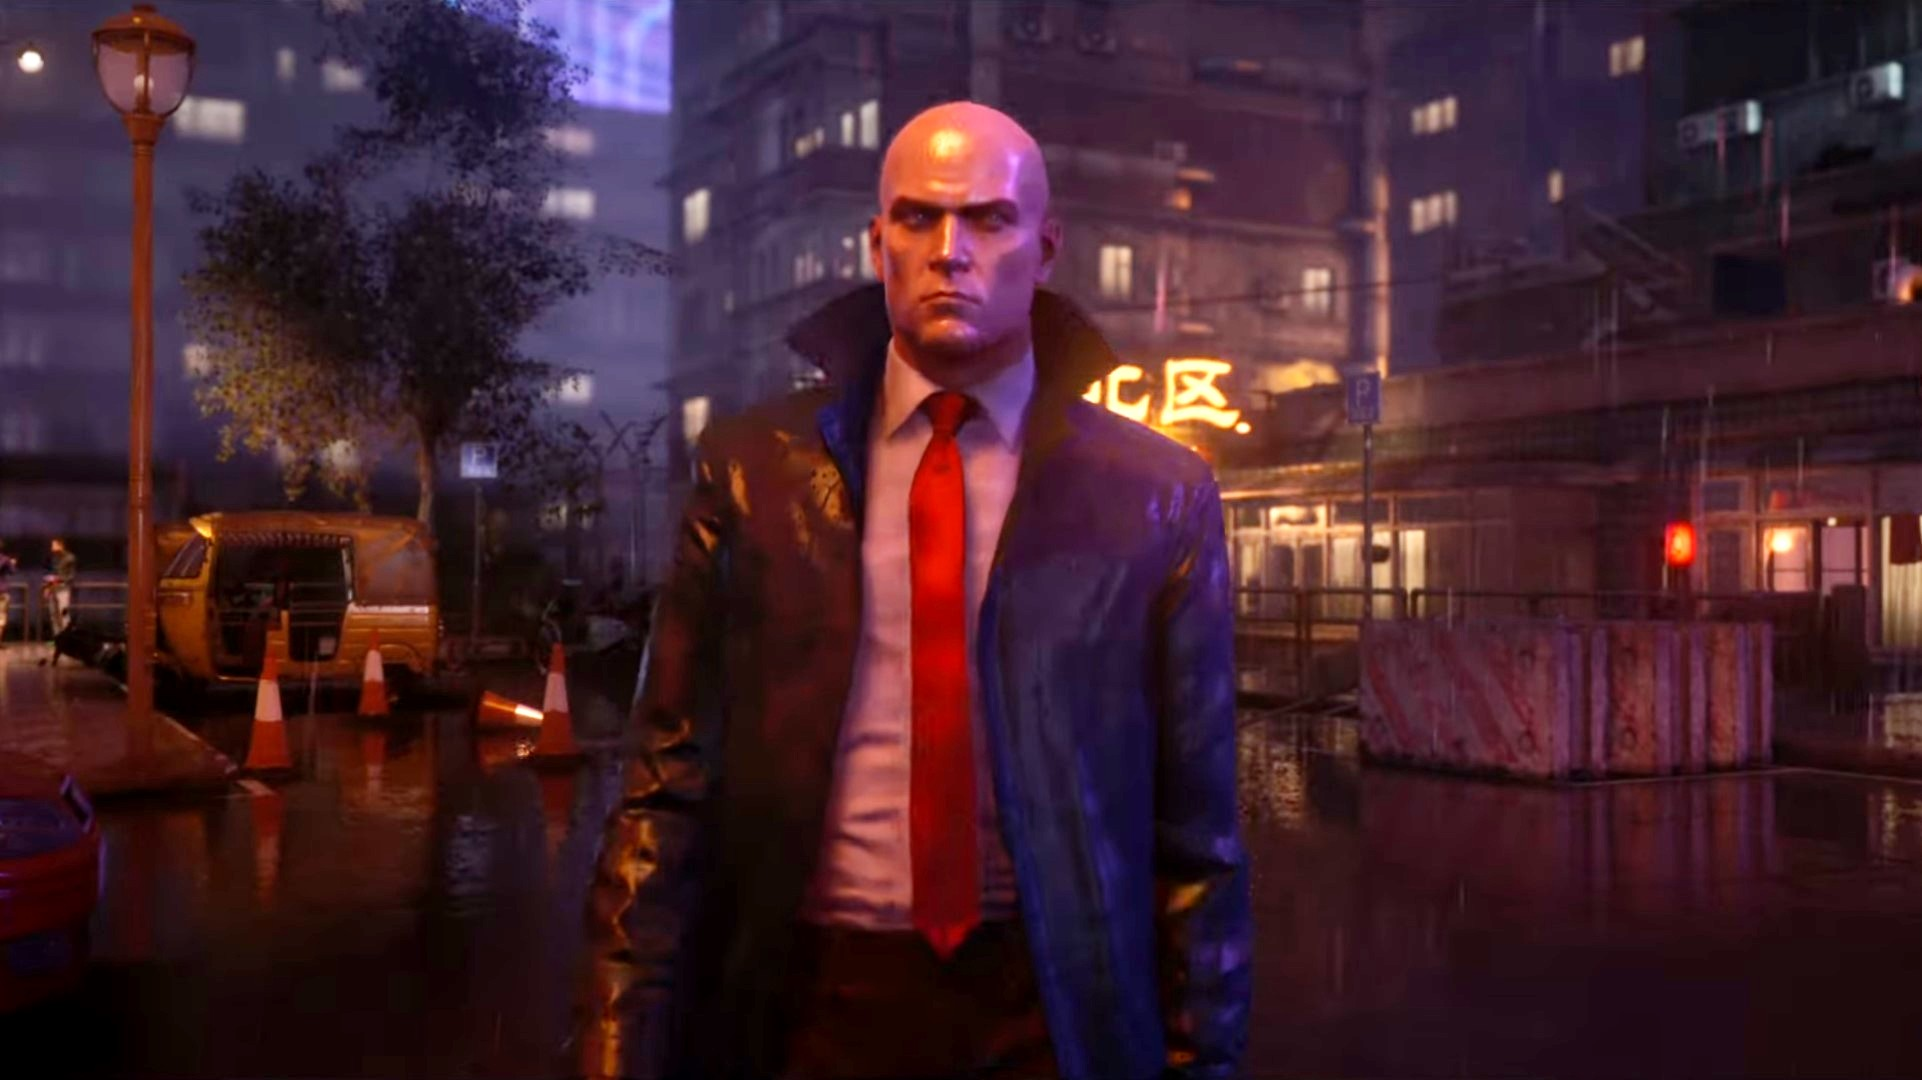 Hitman 3's new Chongqing level looks stunning in its new game engine